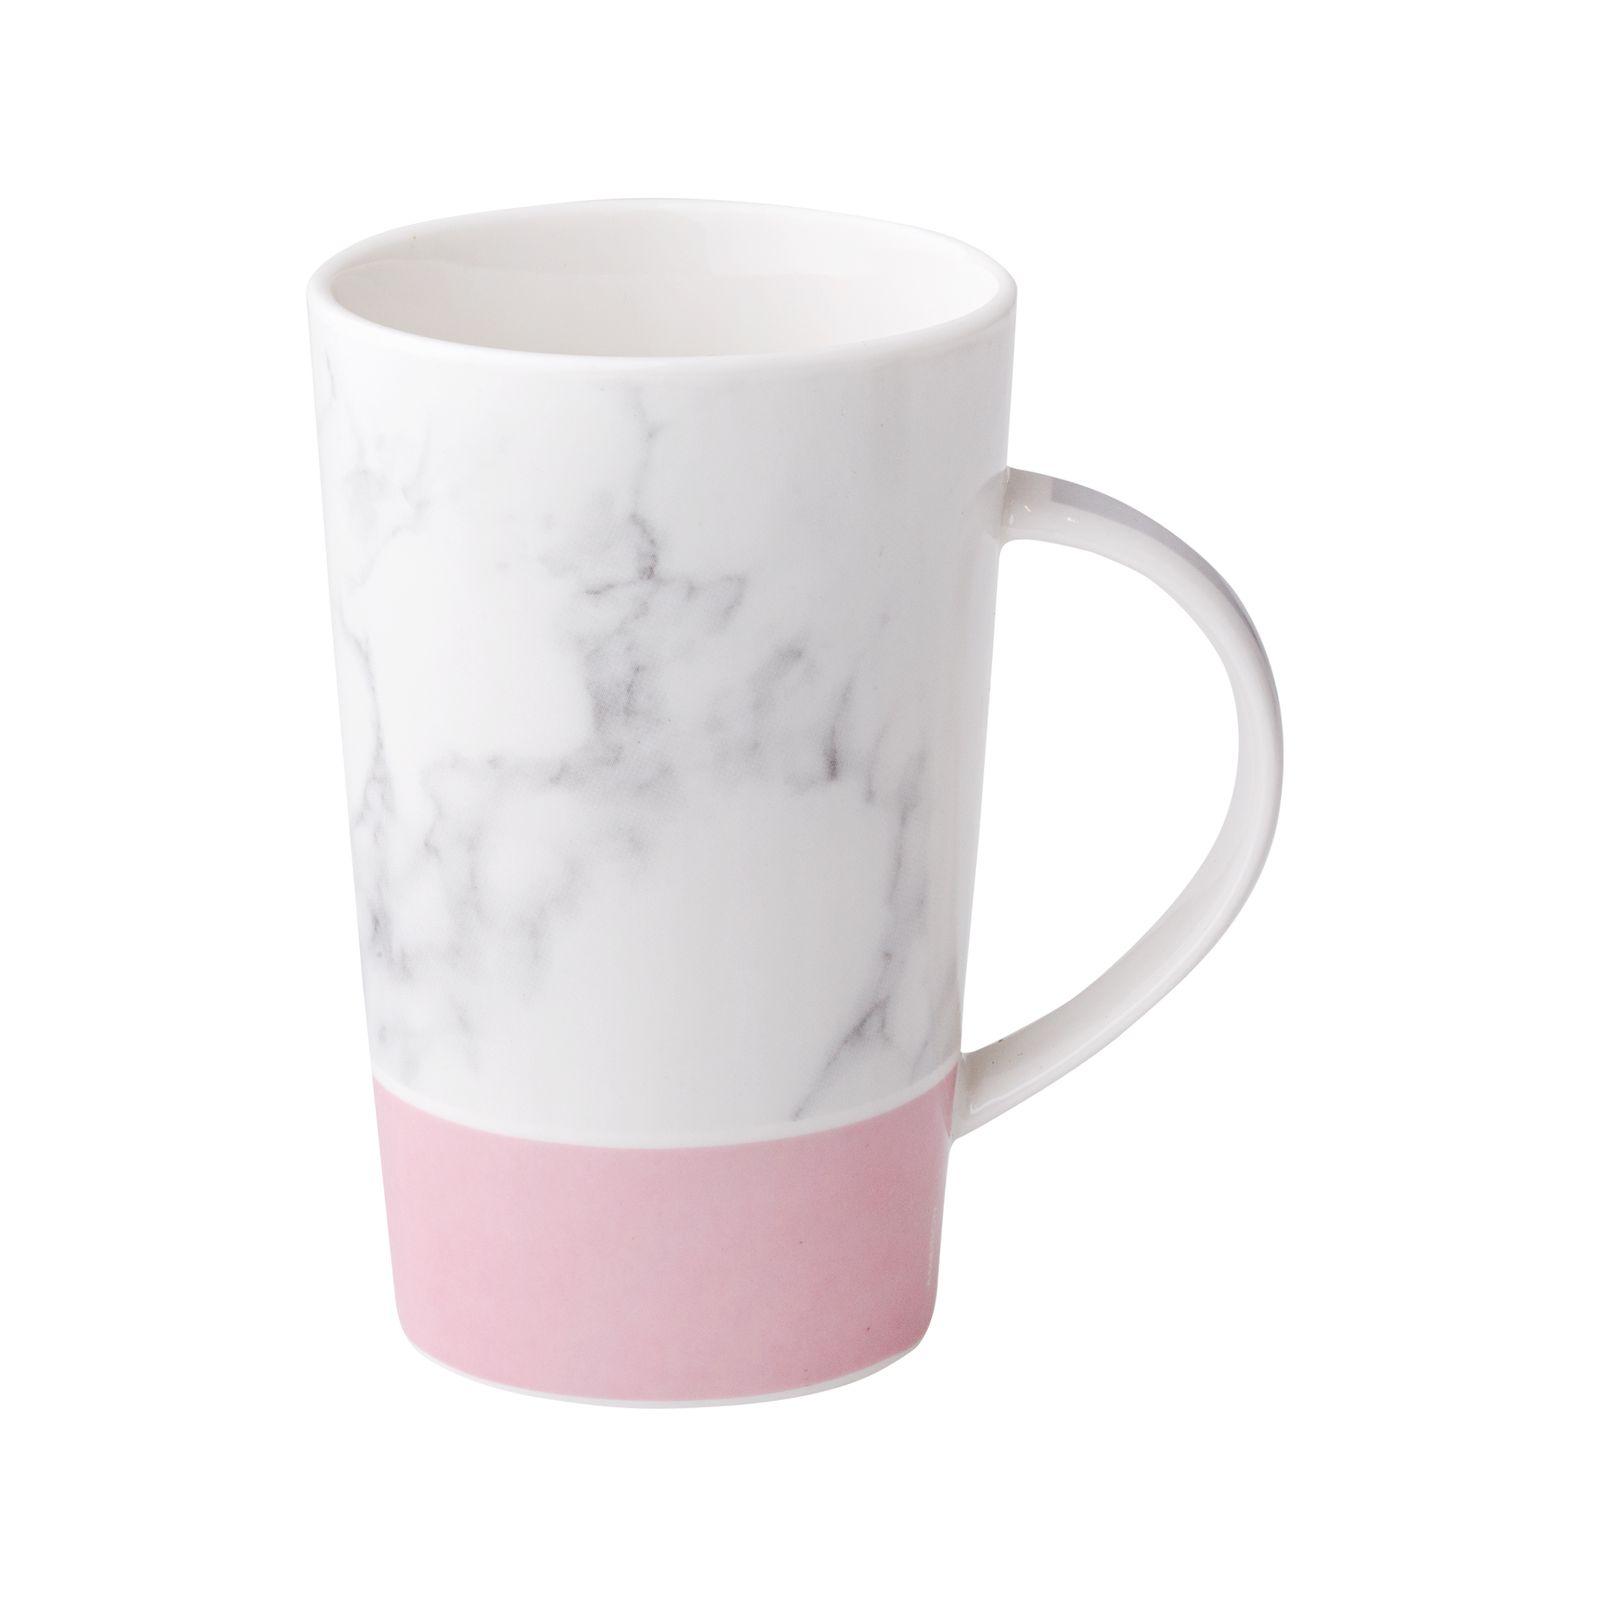 Kubek porcelanowy 430 ml Marble różowy AMBITION